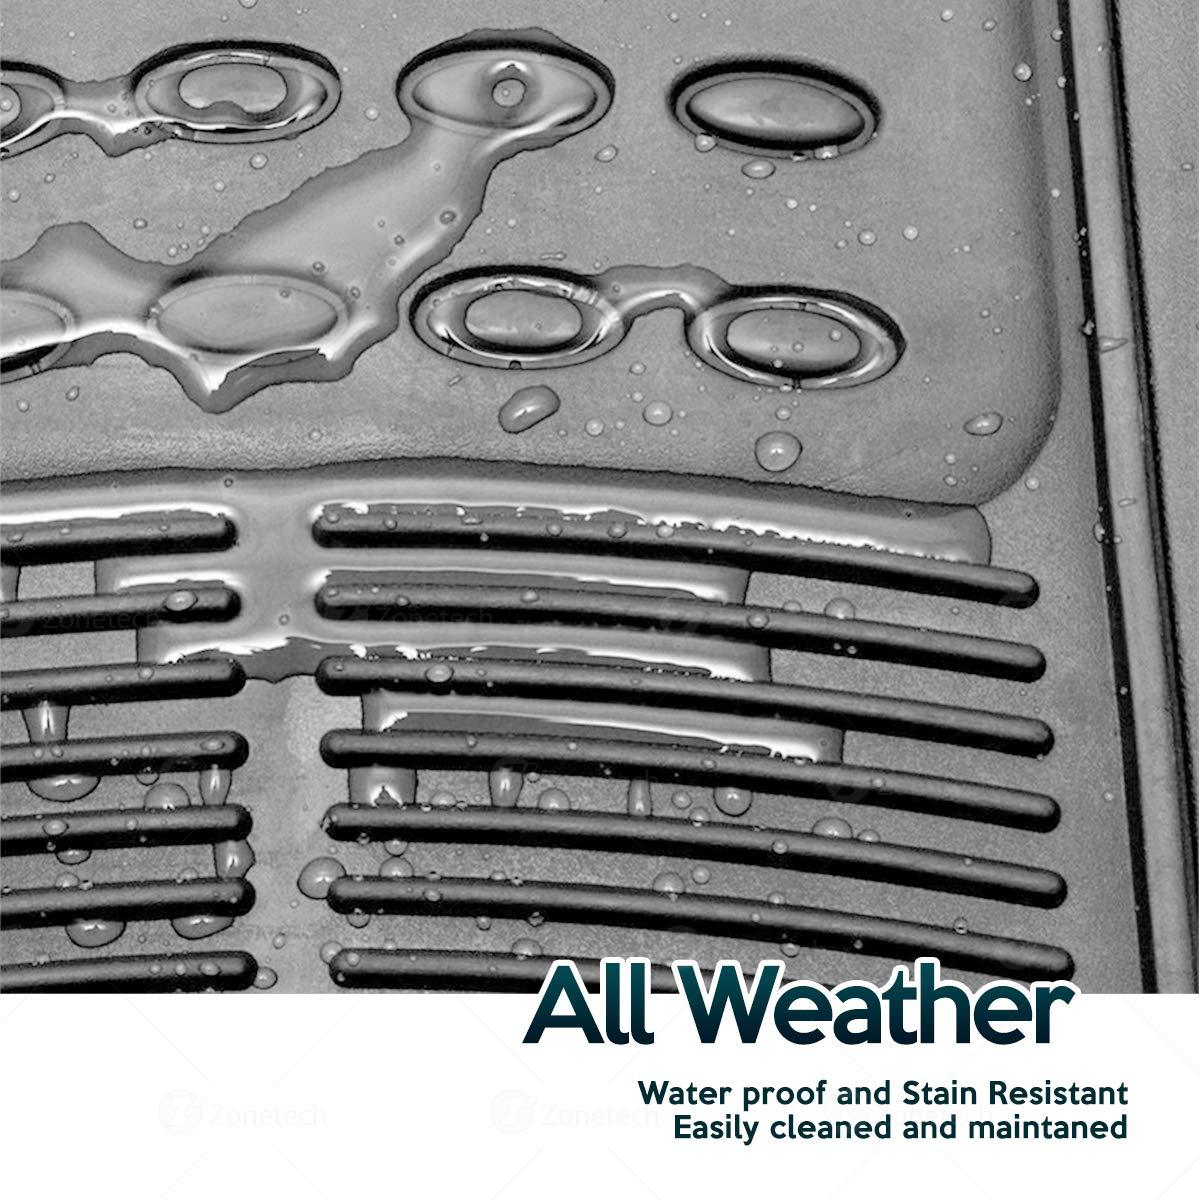 3-Piece Set Gray Heavy Duty Car Interior Floor Mats Zone Tech Floor Mats All Weather Rubber Semi Pattern Car Interior